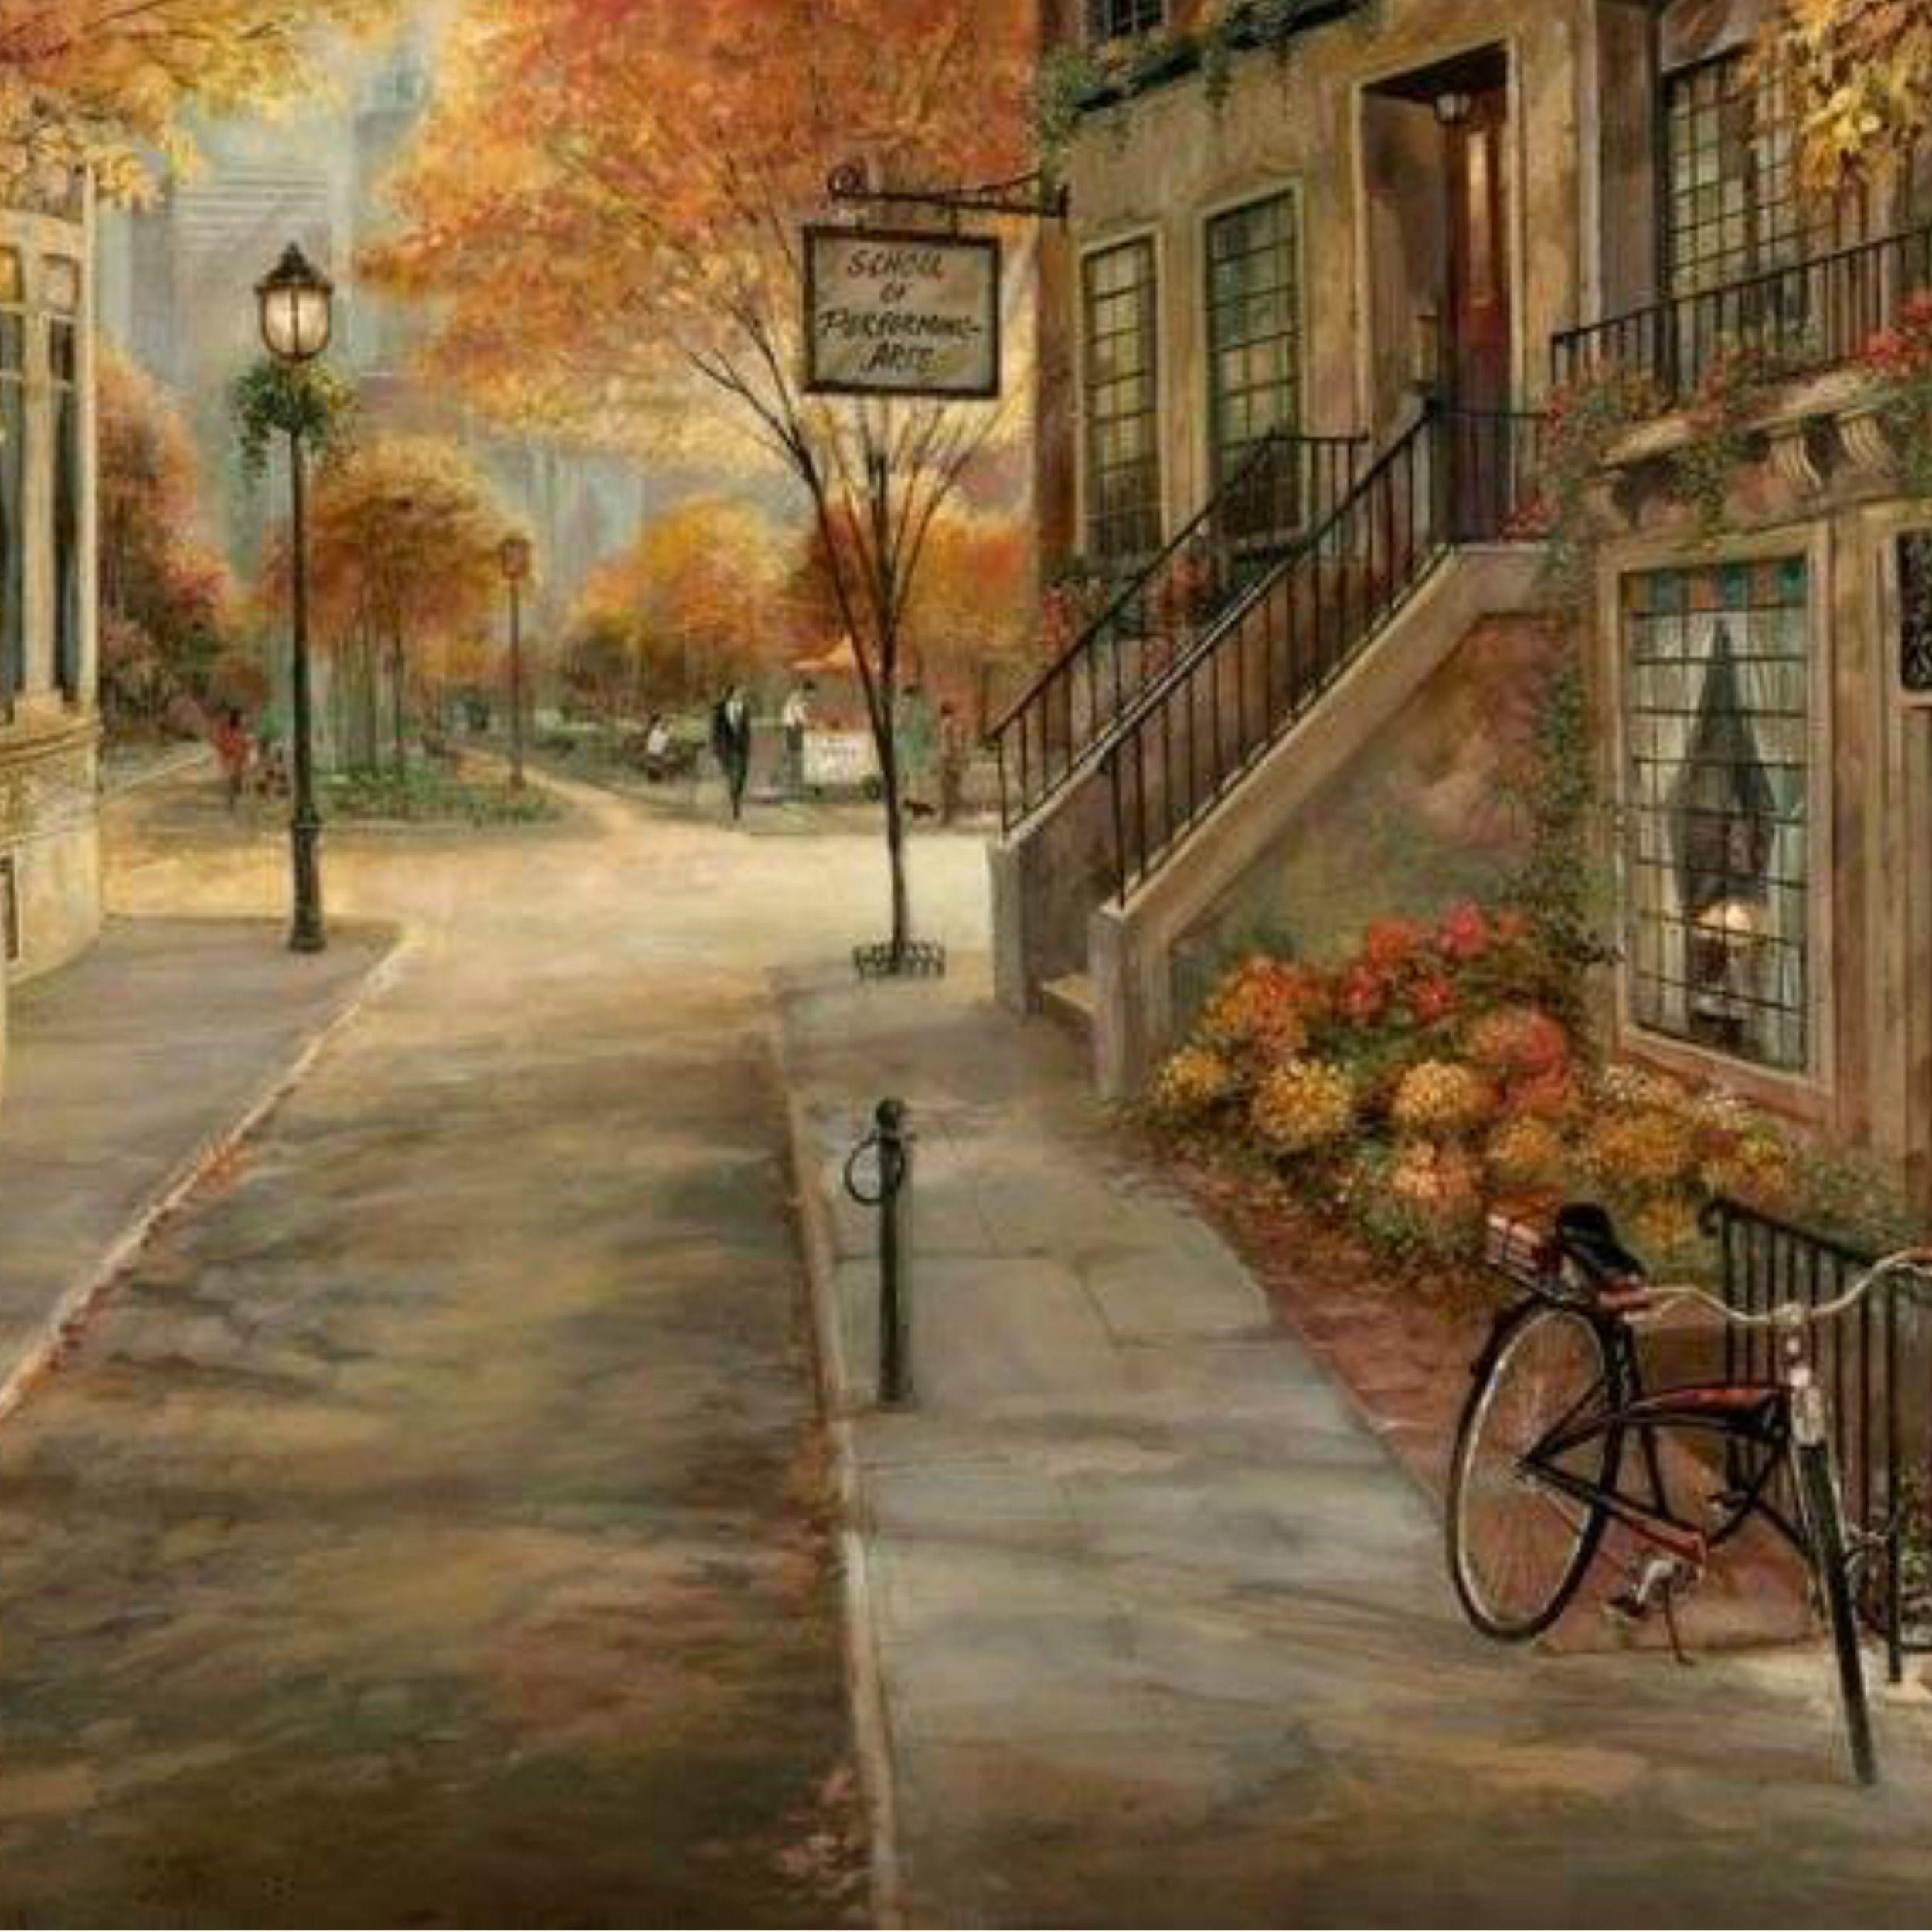 Pin von Luiza Mara auf Art & Paintings - Houses / Landscapes | Pinterest